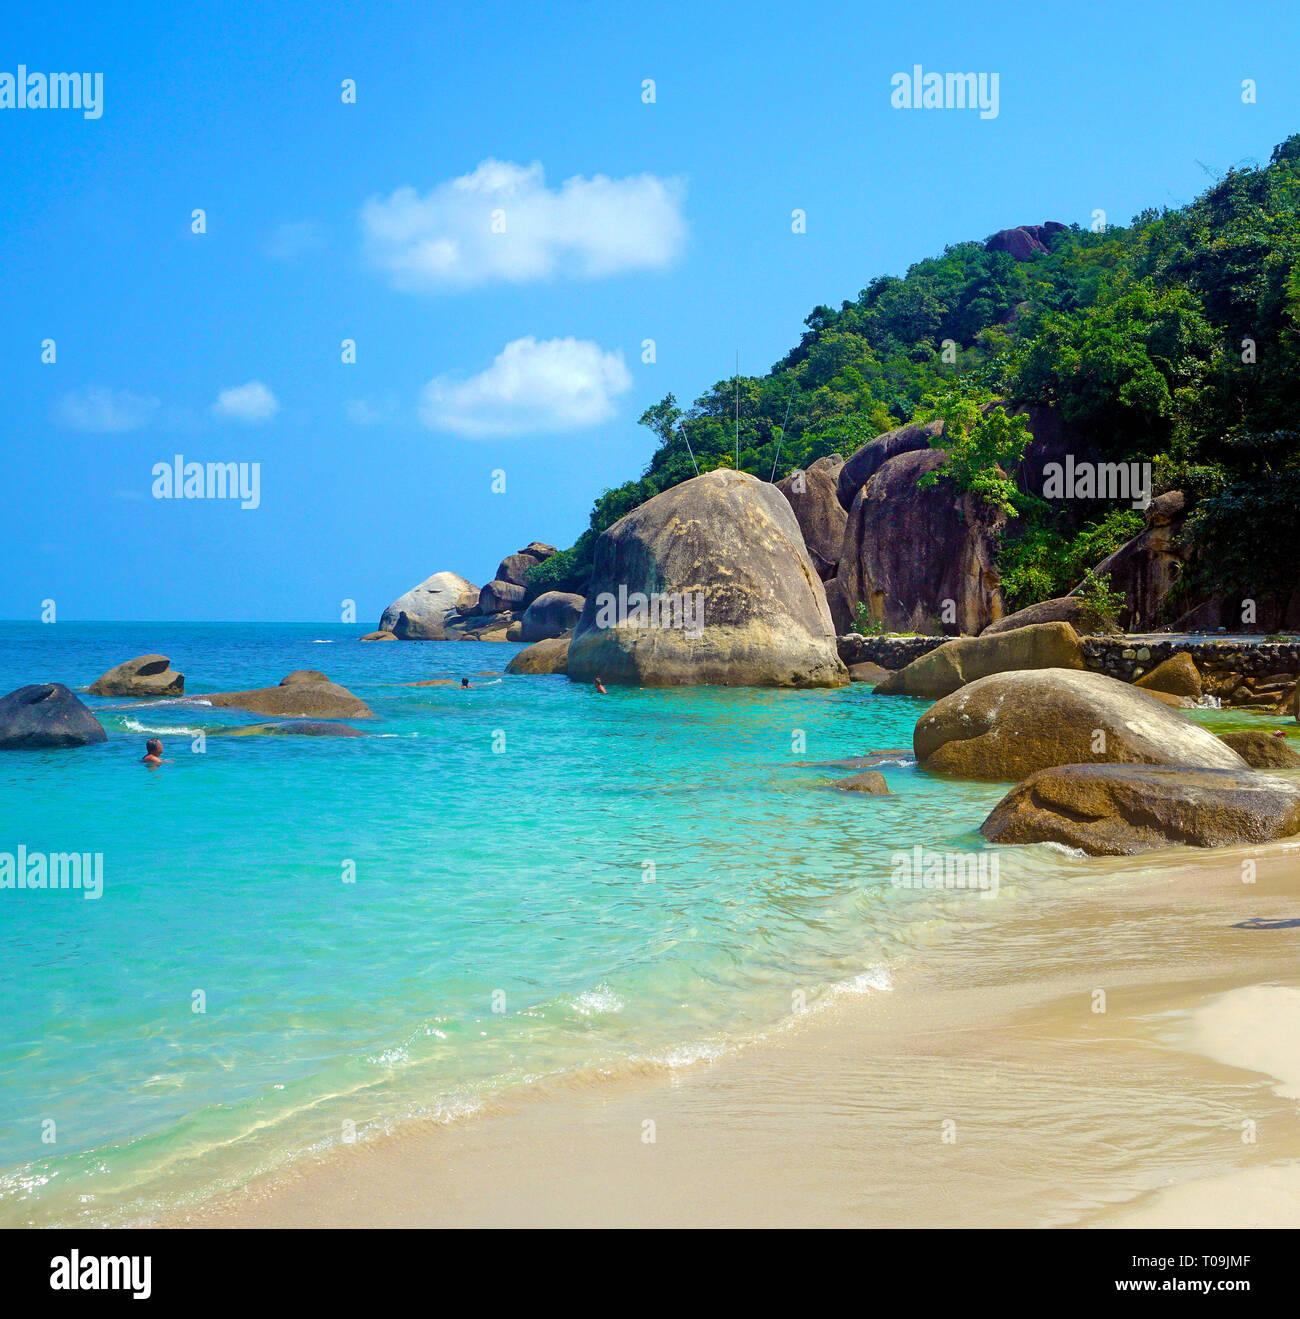 Silver Beach, Chrystal Bay, Koh Samui, Golf von Thailand, Thailand | Silver Beach, Chrystal Bay, Koh Samui, Gulf of Thailand, Thailand - Stock Image